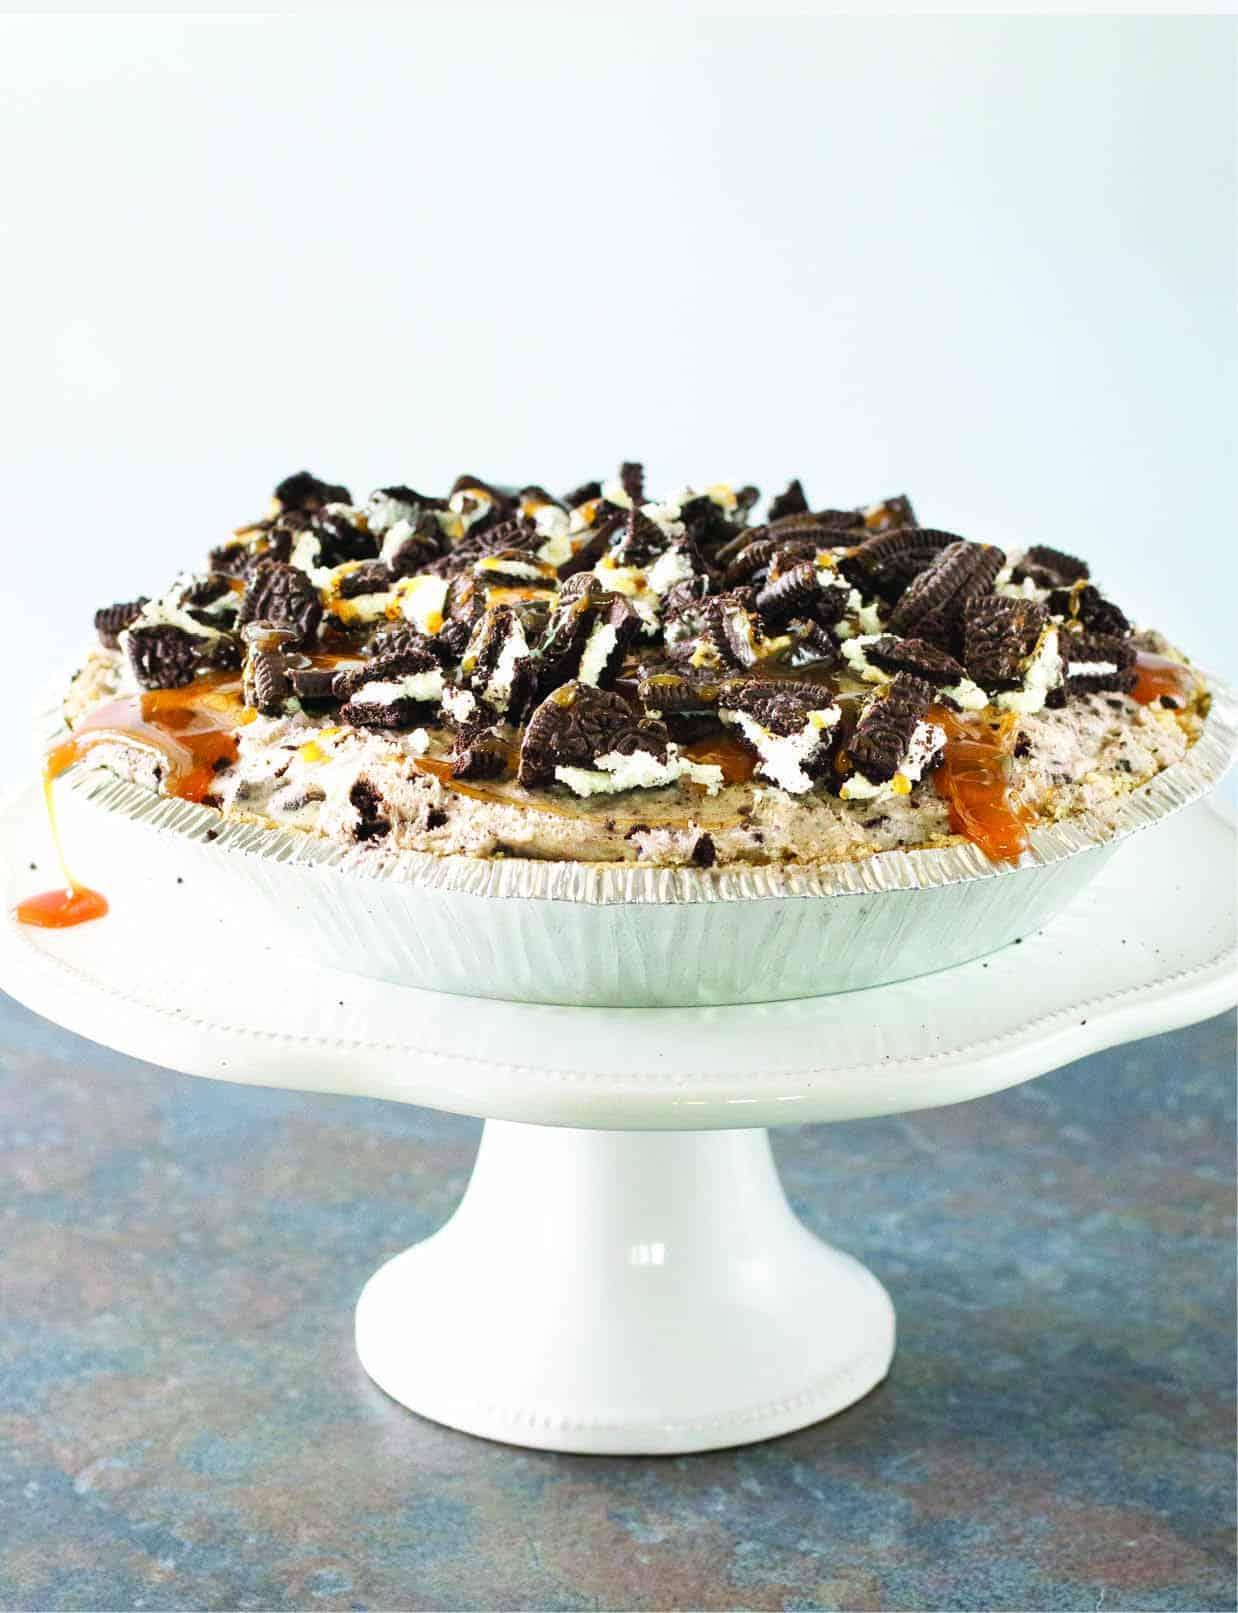 8-16 Food_Indulgent Desserts_web1